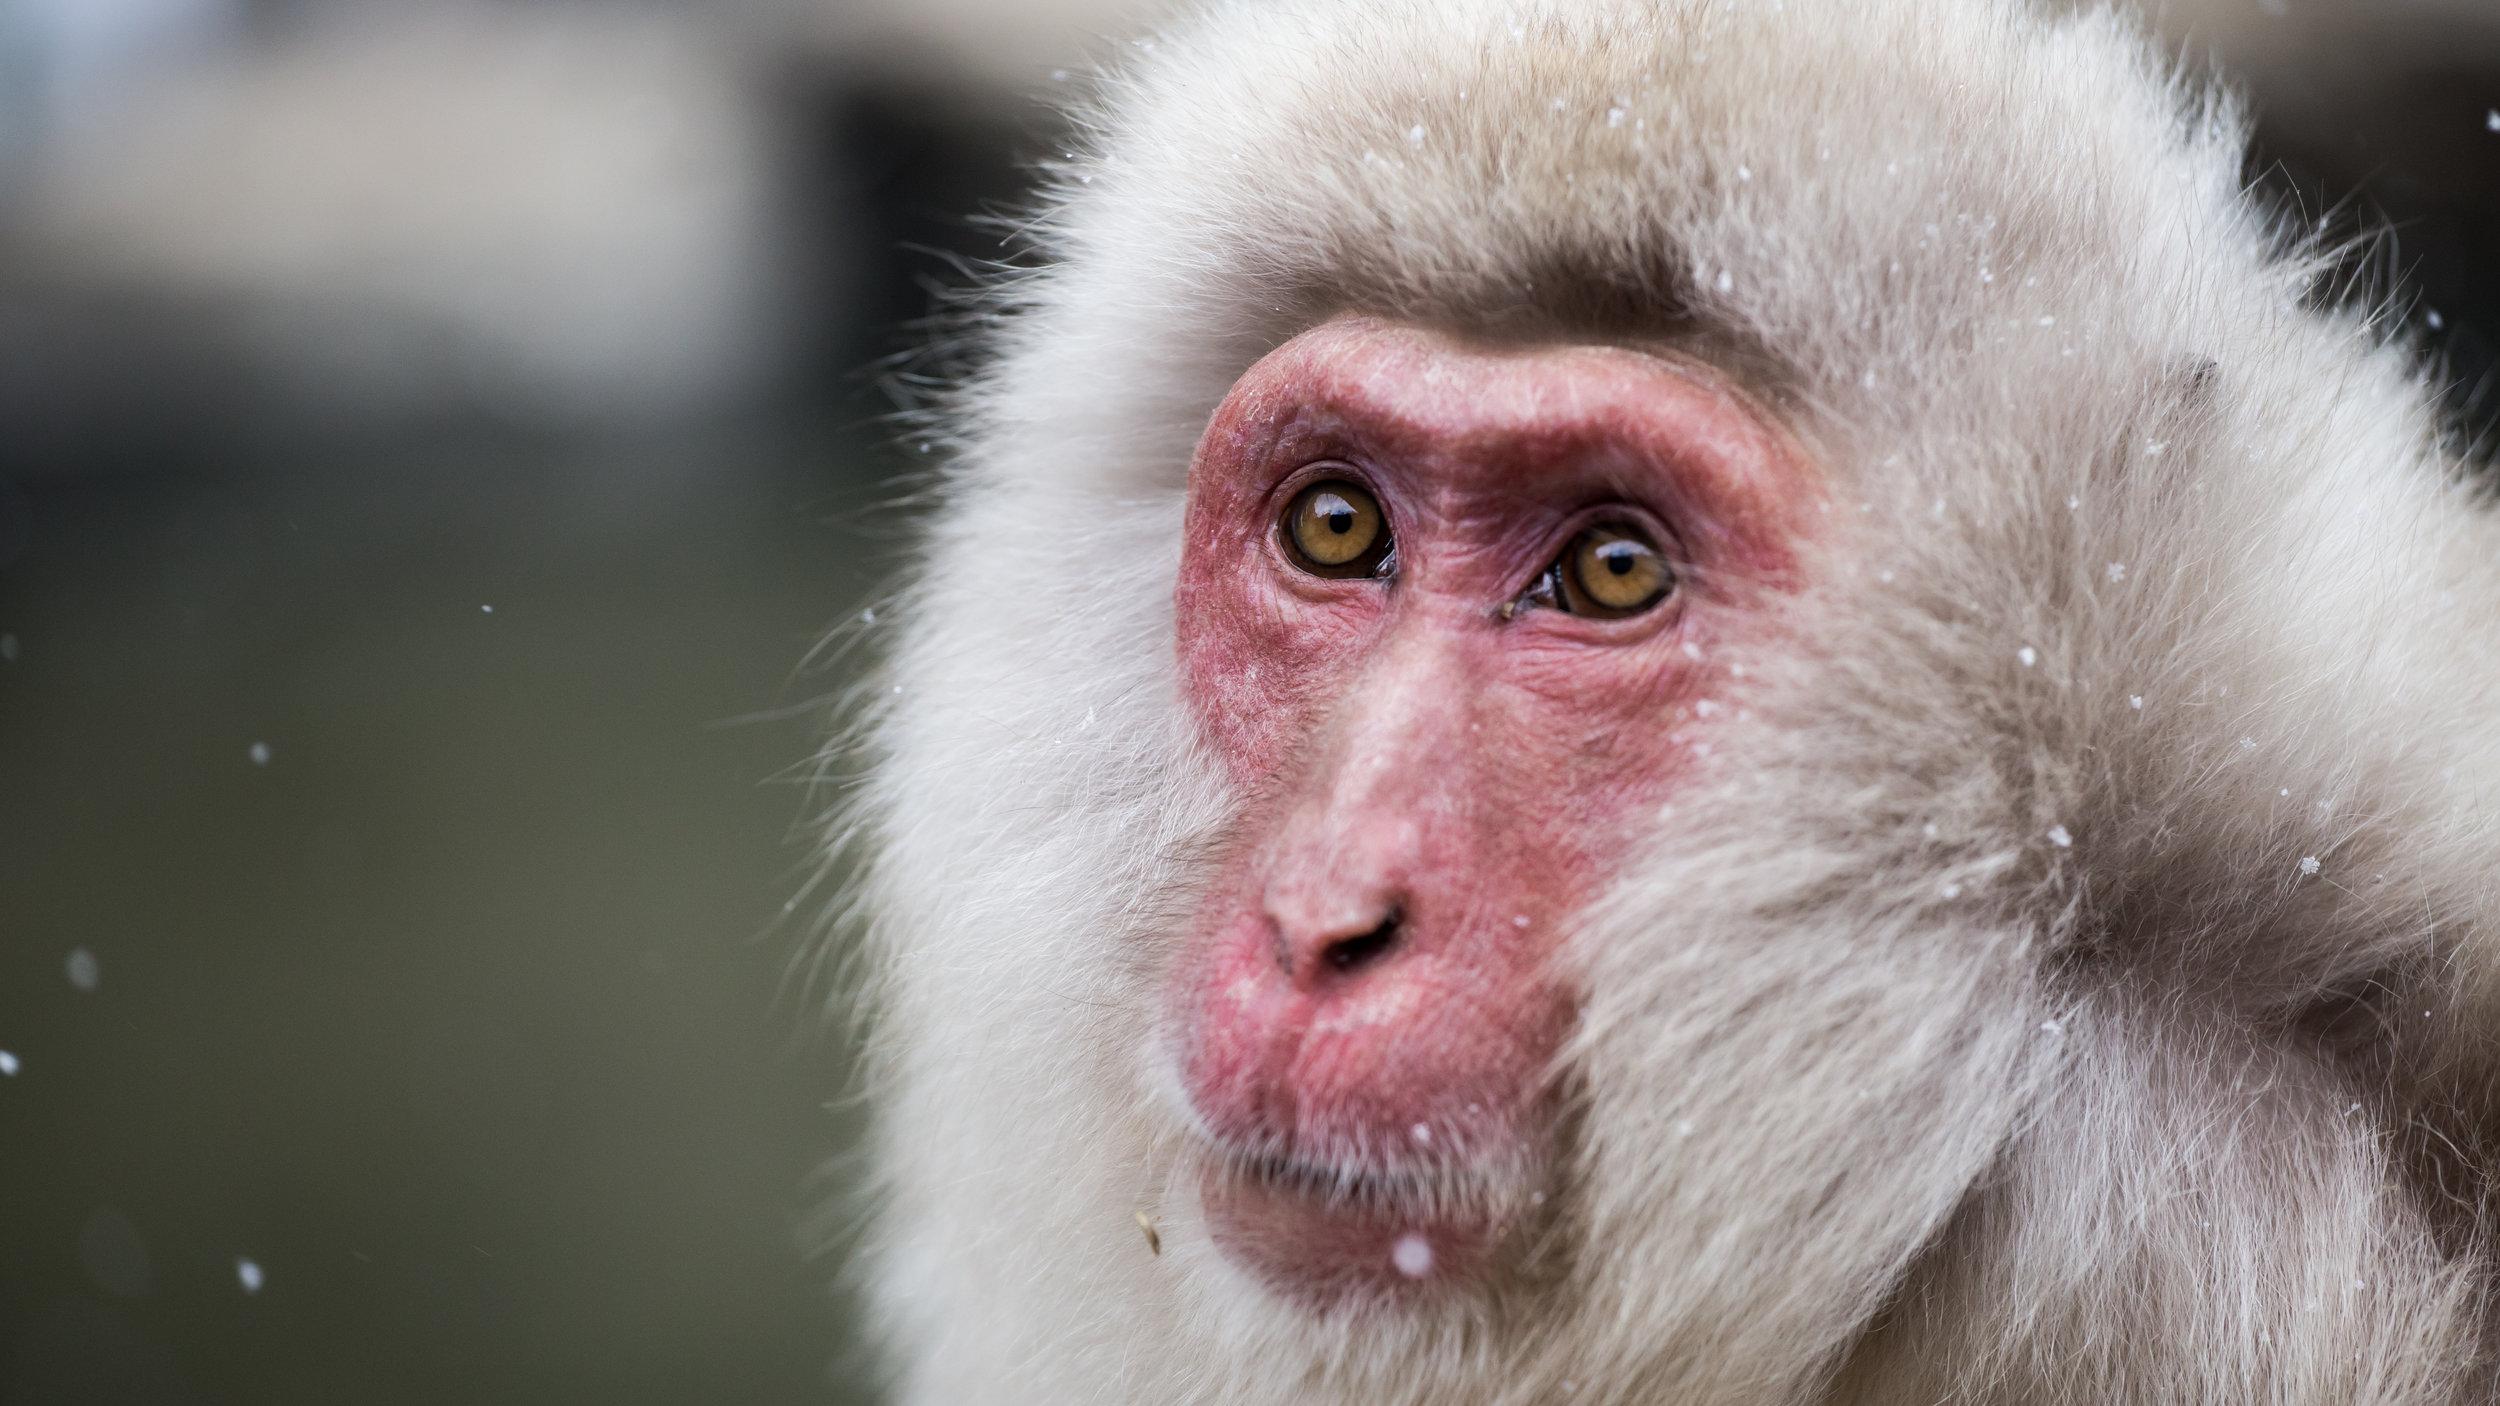 Snow Monkey at Jigokudani Monkey Park